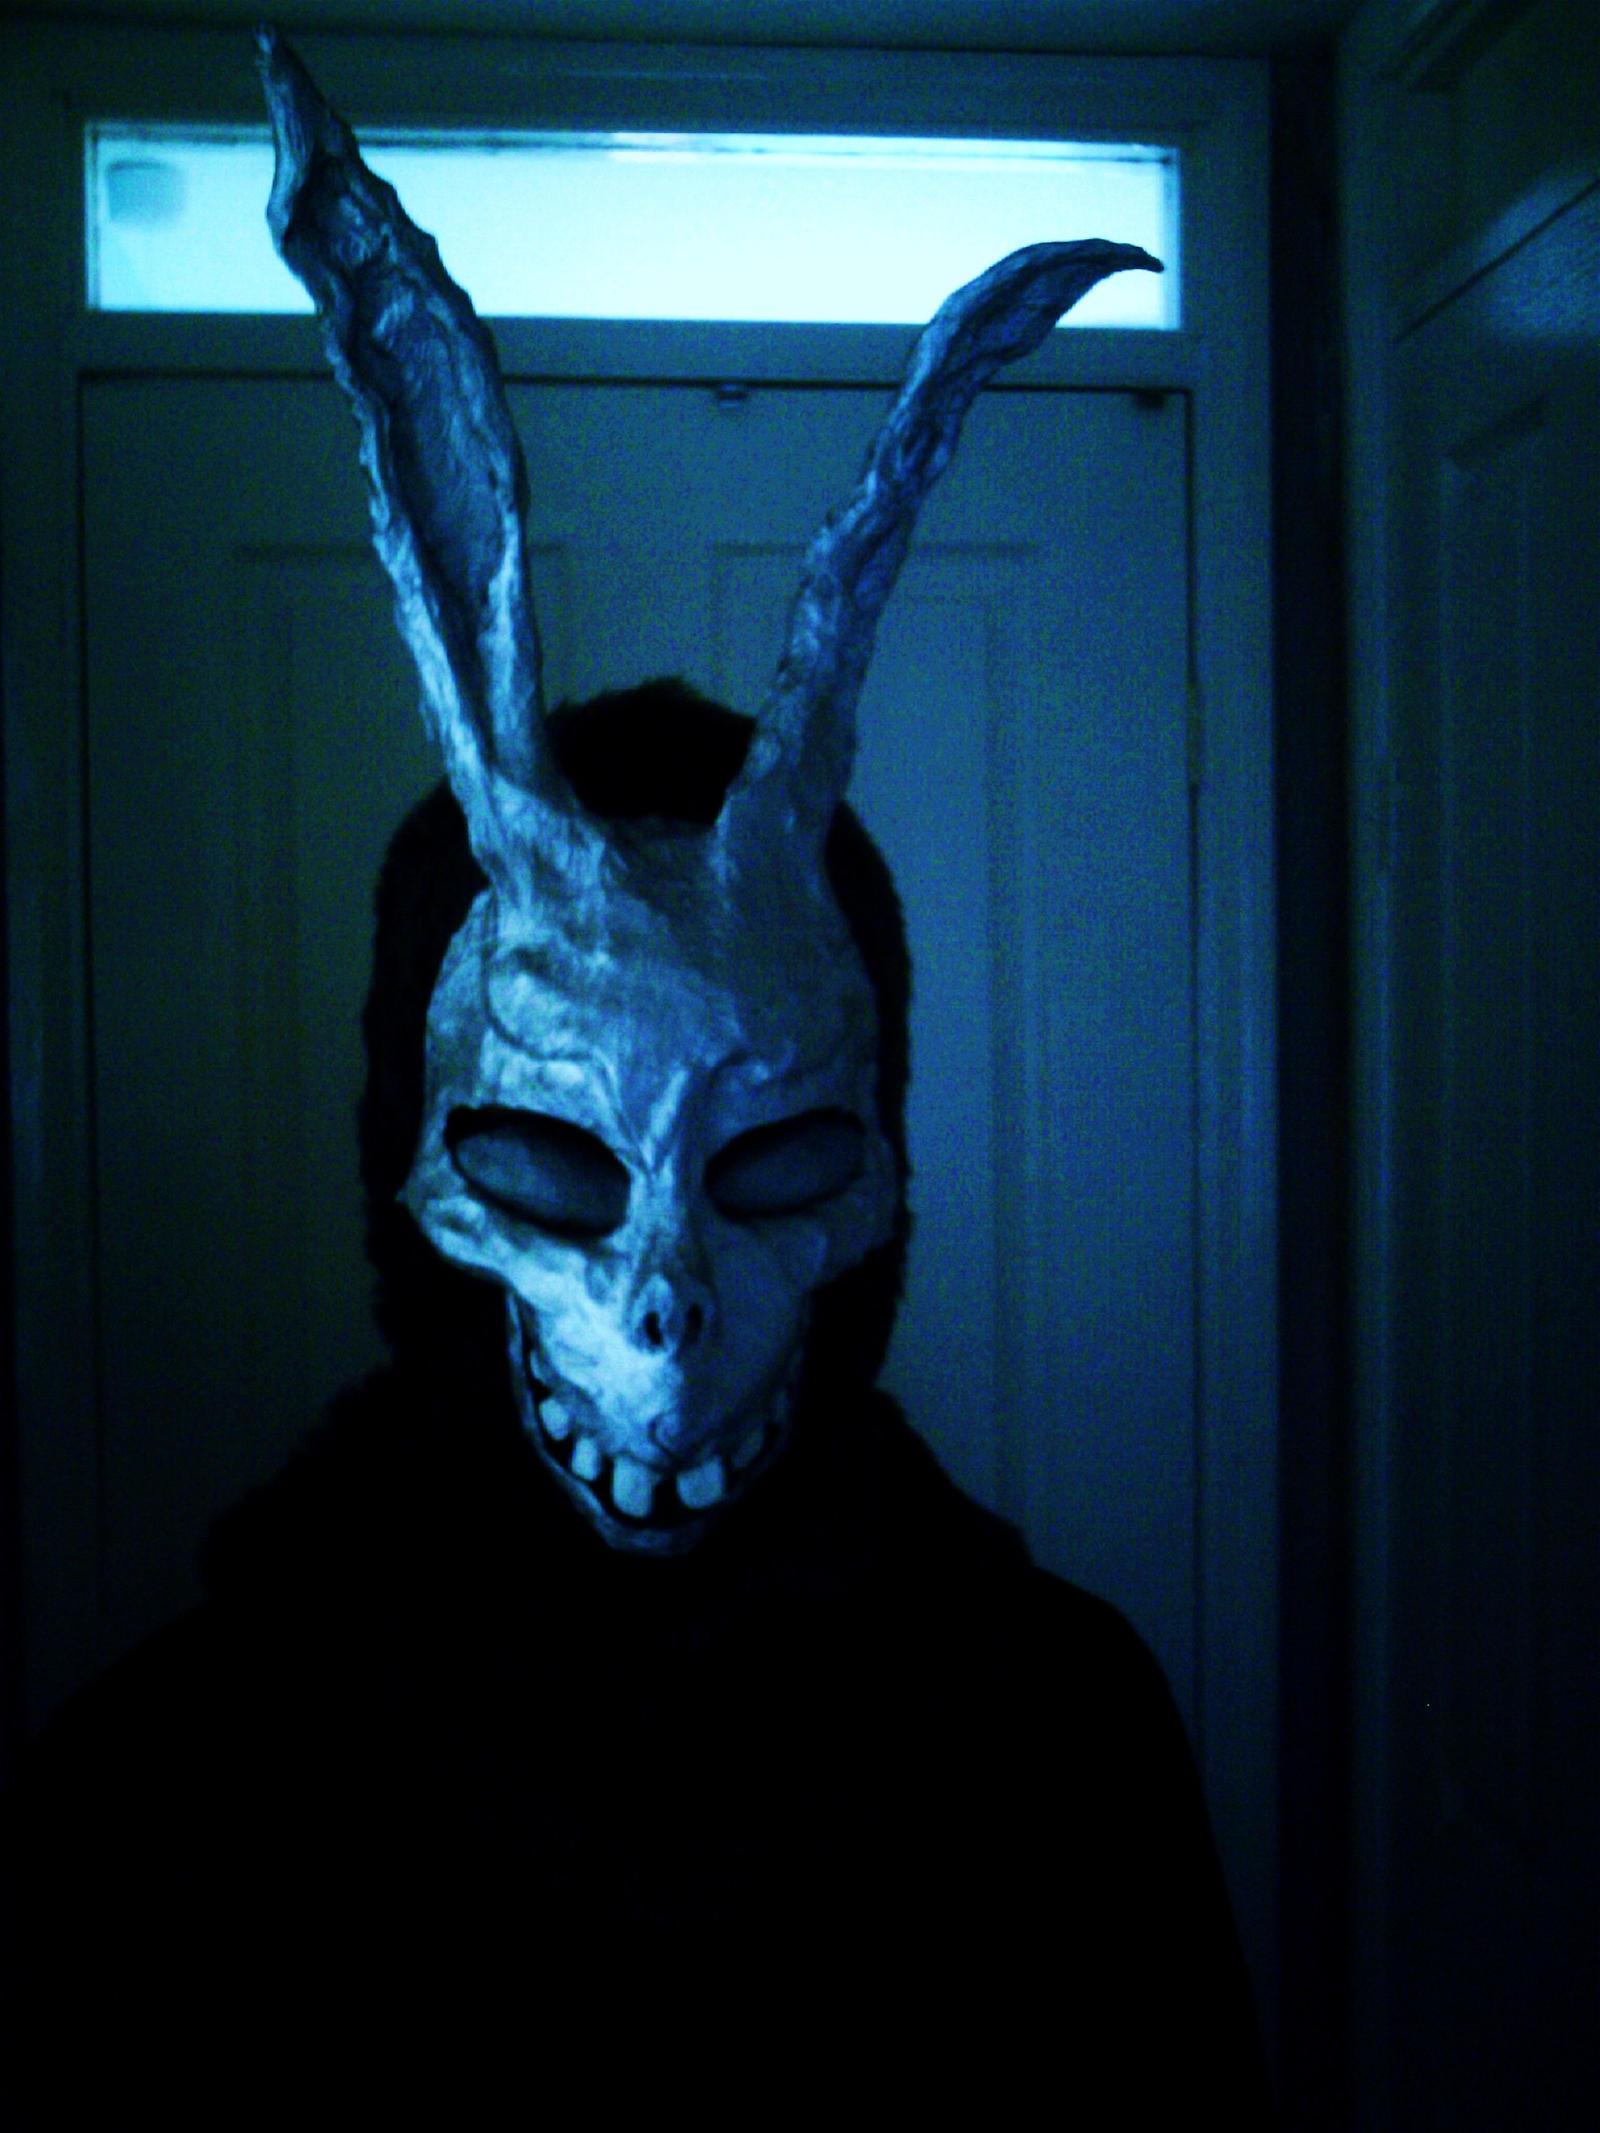 Frank the Rabbit mask by braindeadmystuff on DeviantArt